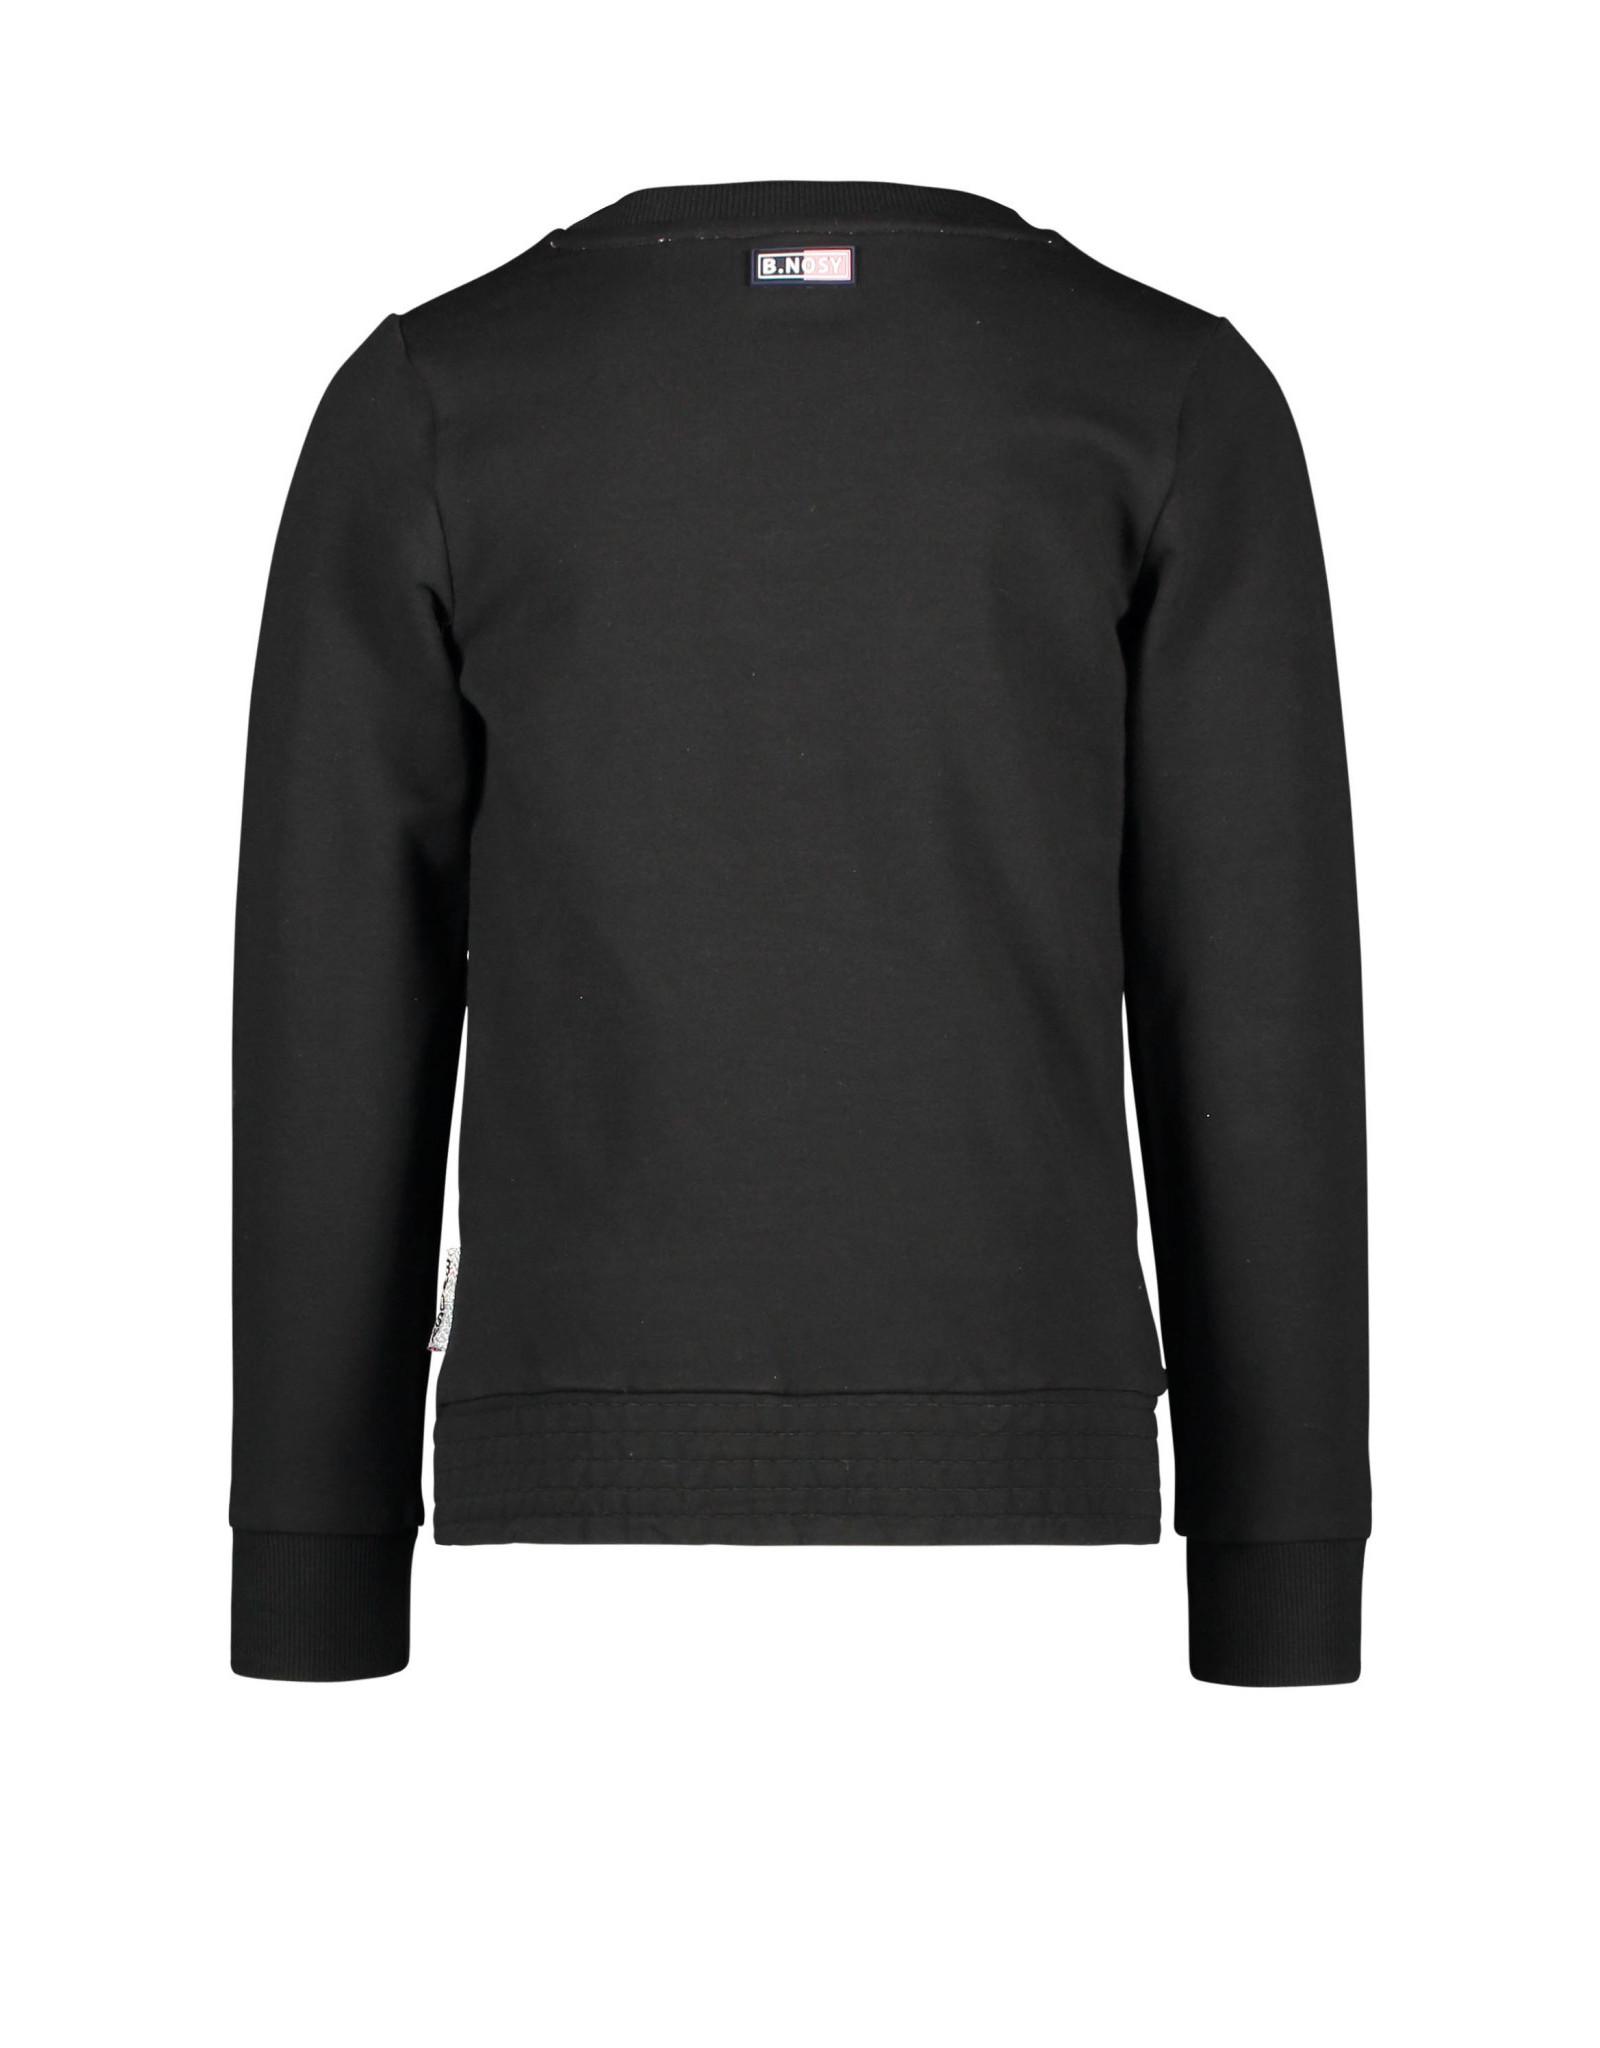 B-nosy Girls sweater with fancy artwork, full elasticated wb 099 Black